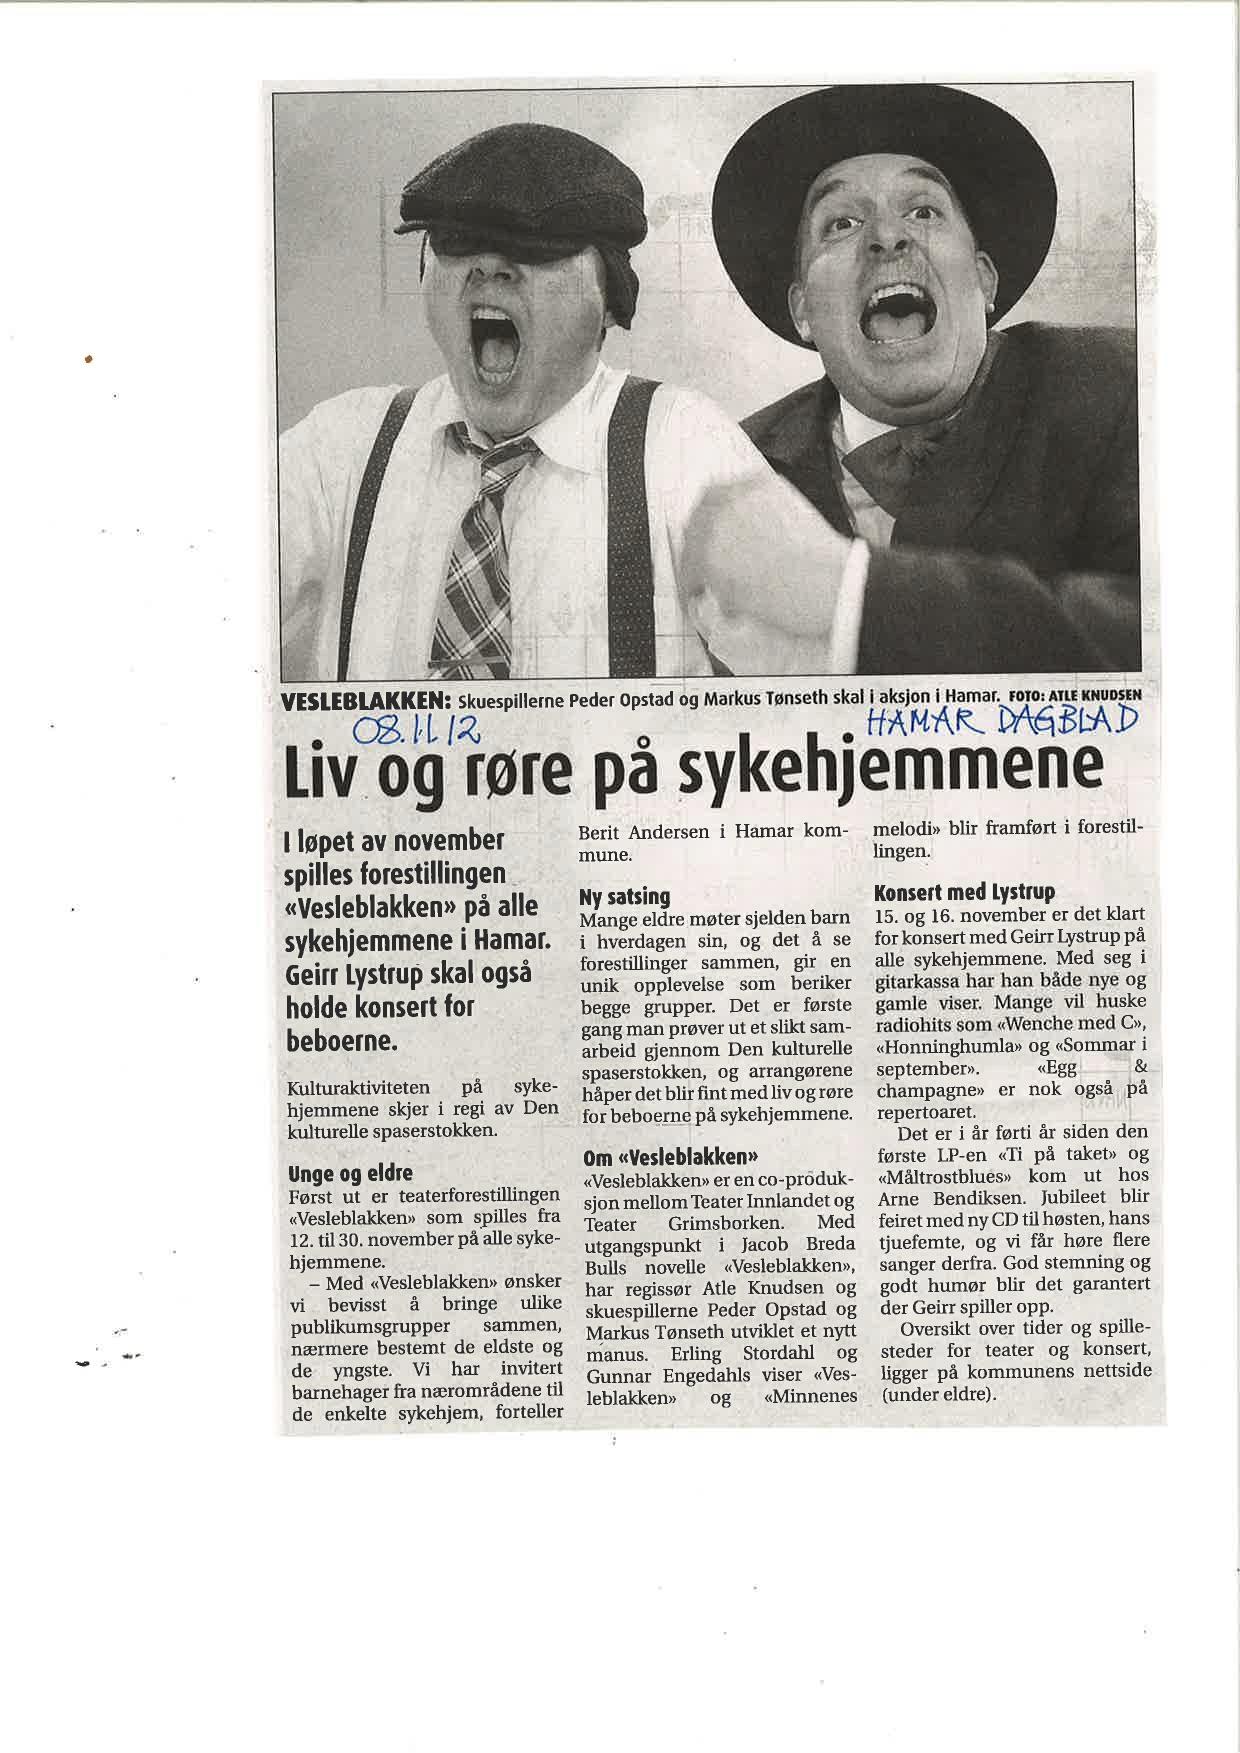 Nov 08 2012 Hamar Dagblad.jpg